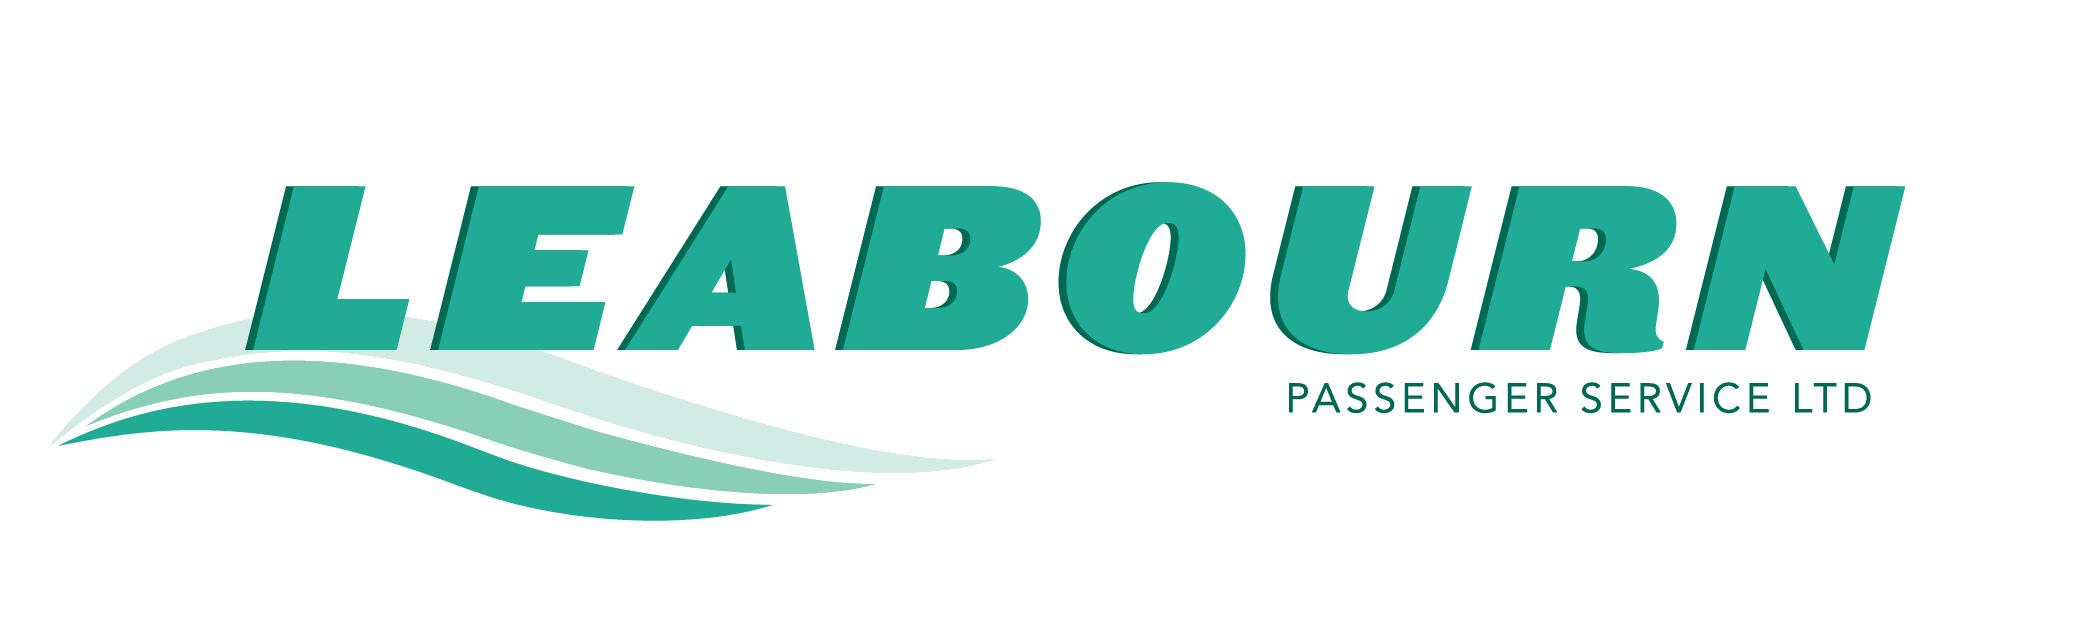 Leabourn Passenger Services